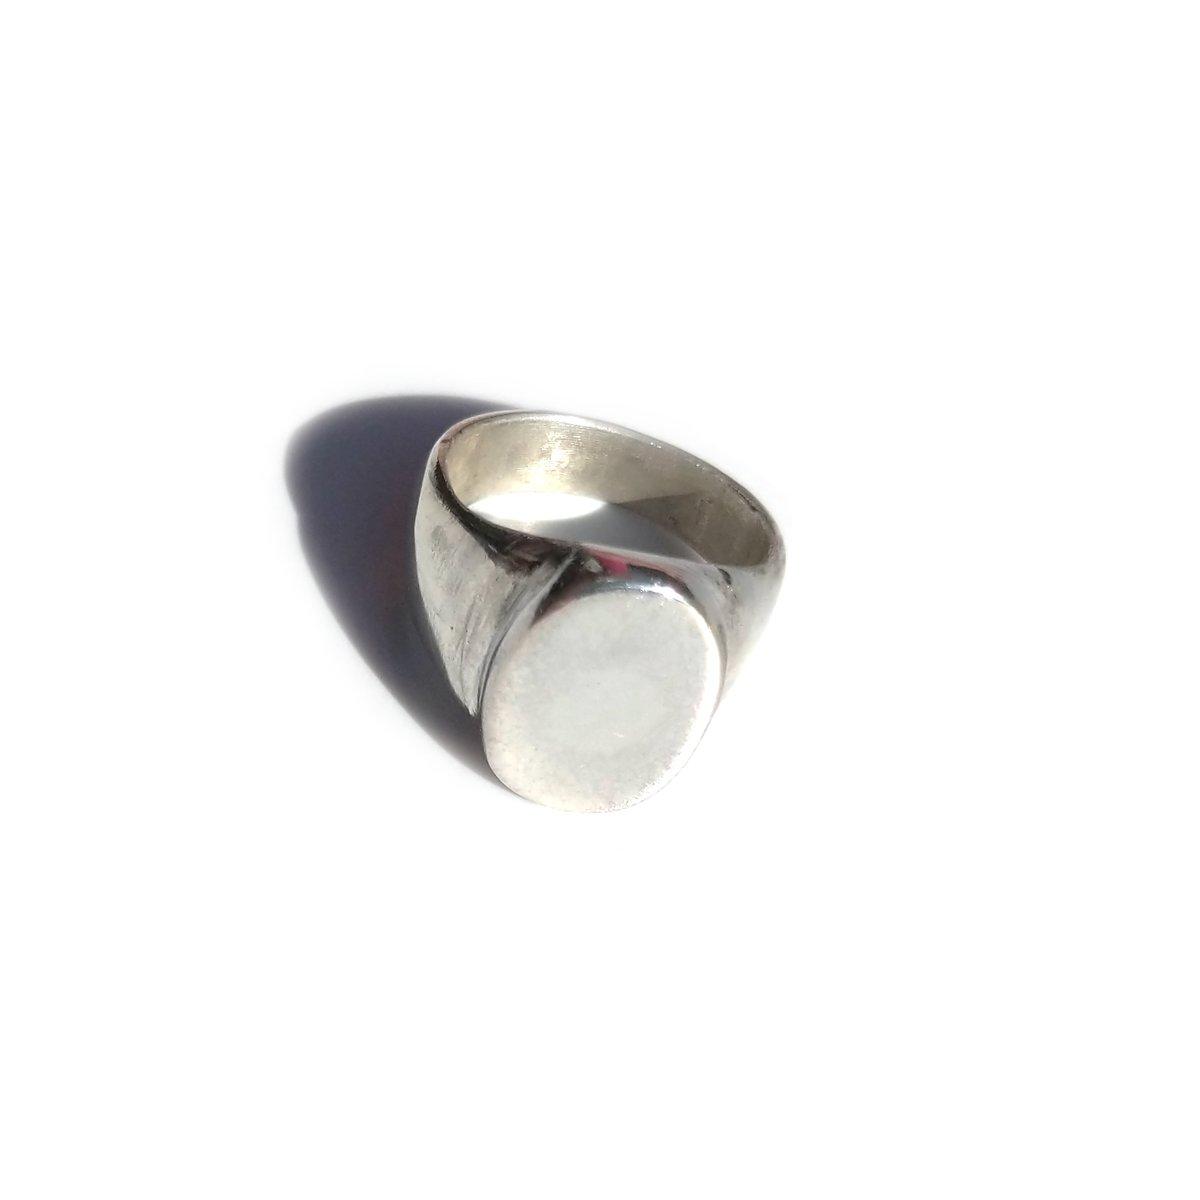 Image of Ring #1